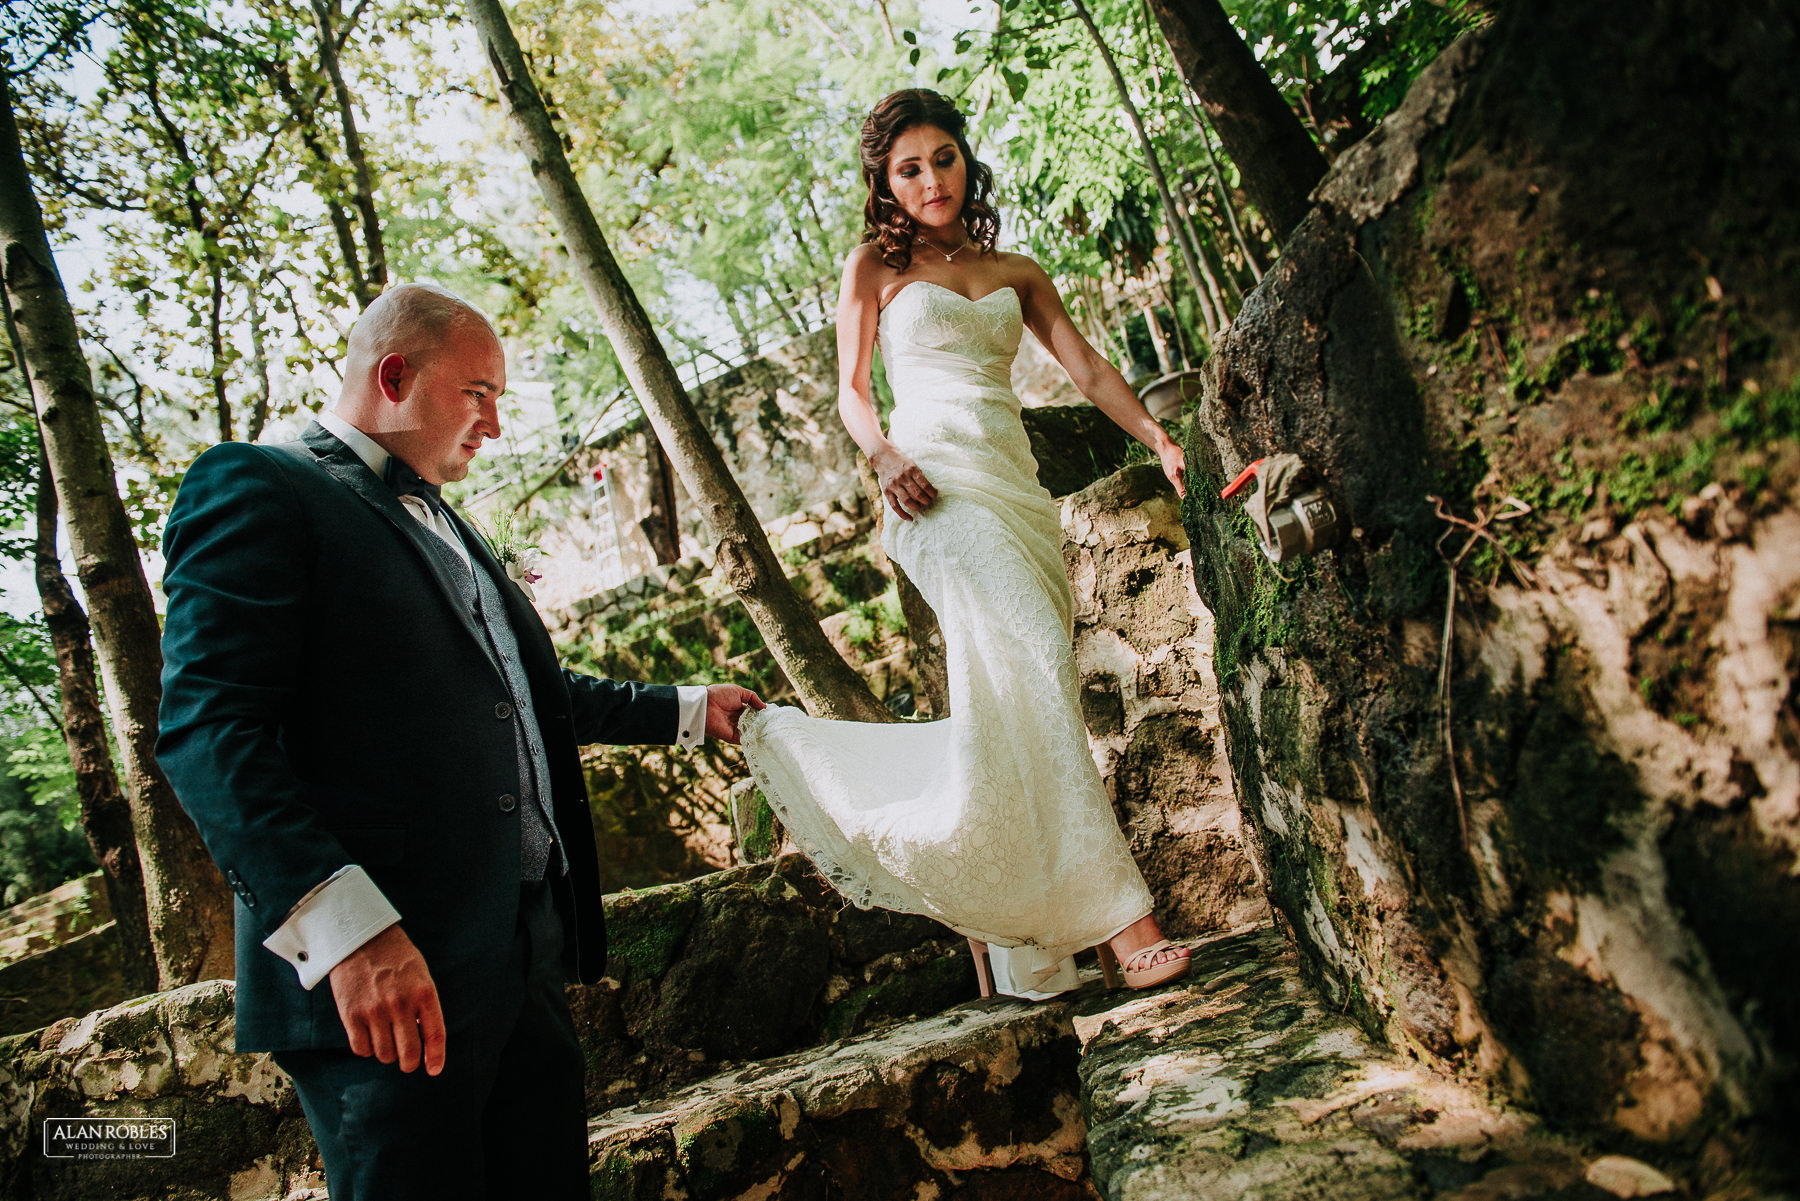 Fotografo de bodas guadalajara Alan Robles - Pinare terraza bistro 16